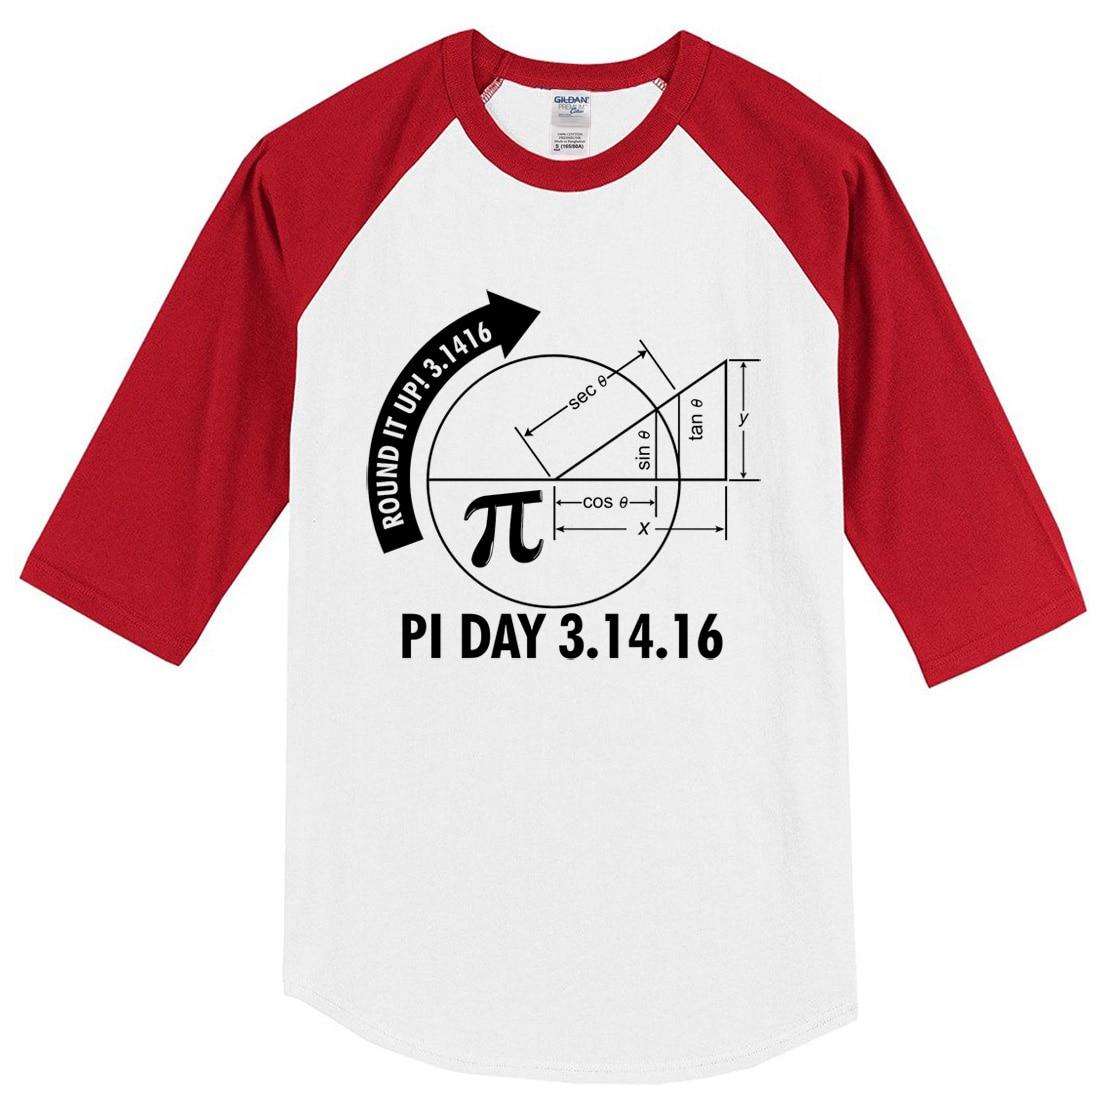 2017 summer T-shirts Pi Day 3.1416 Round It Up Math Graph STEM T-Shirt harajuku sportwear crossfit brand clothing raglan t shirt